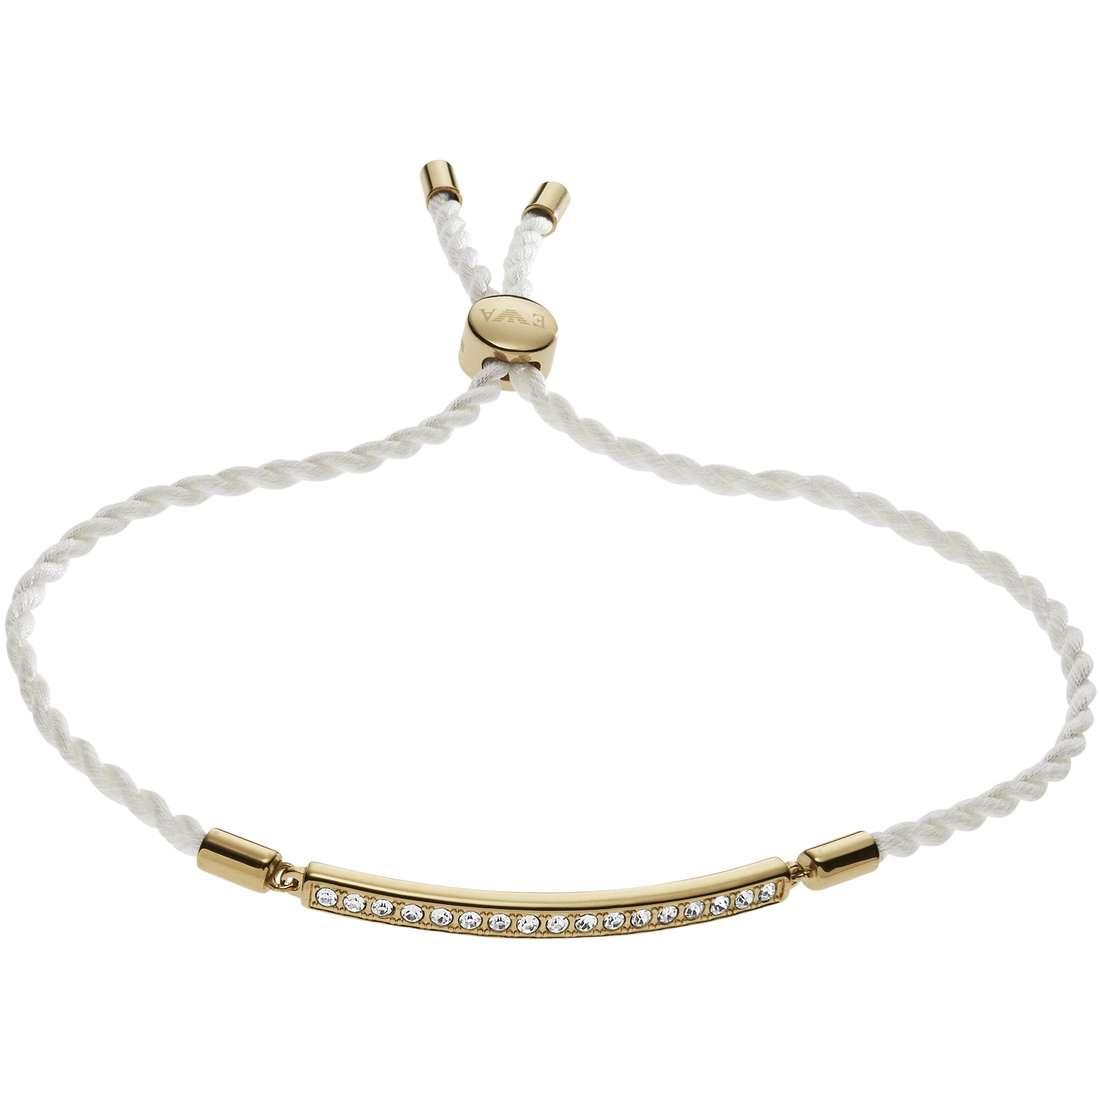 bracelet woman jewellery Emporio Armani Architectural Elegance EGS2192710